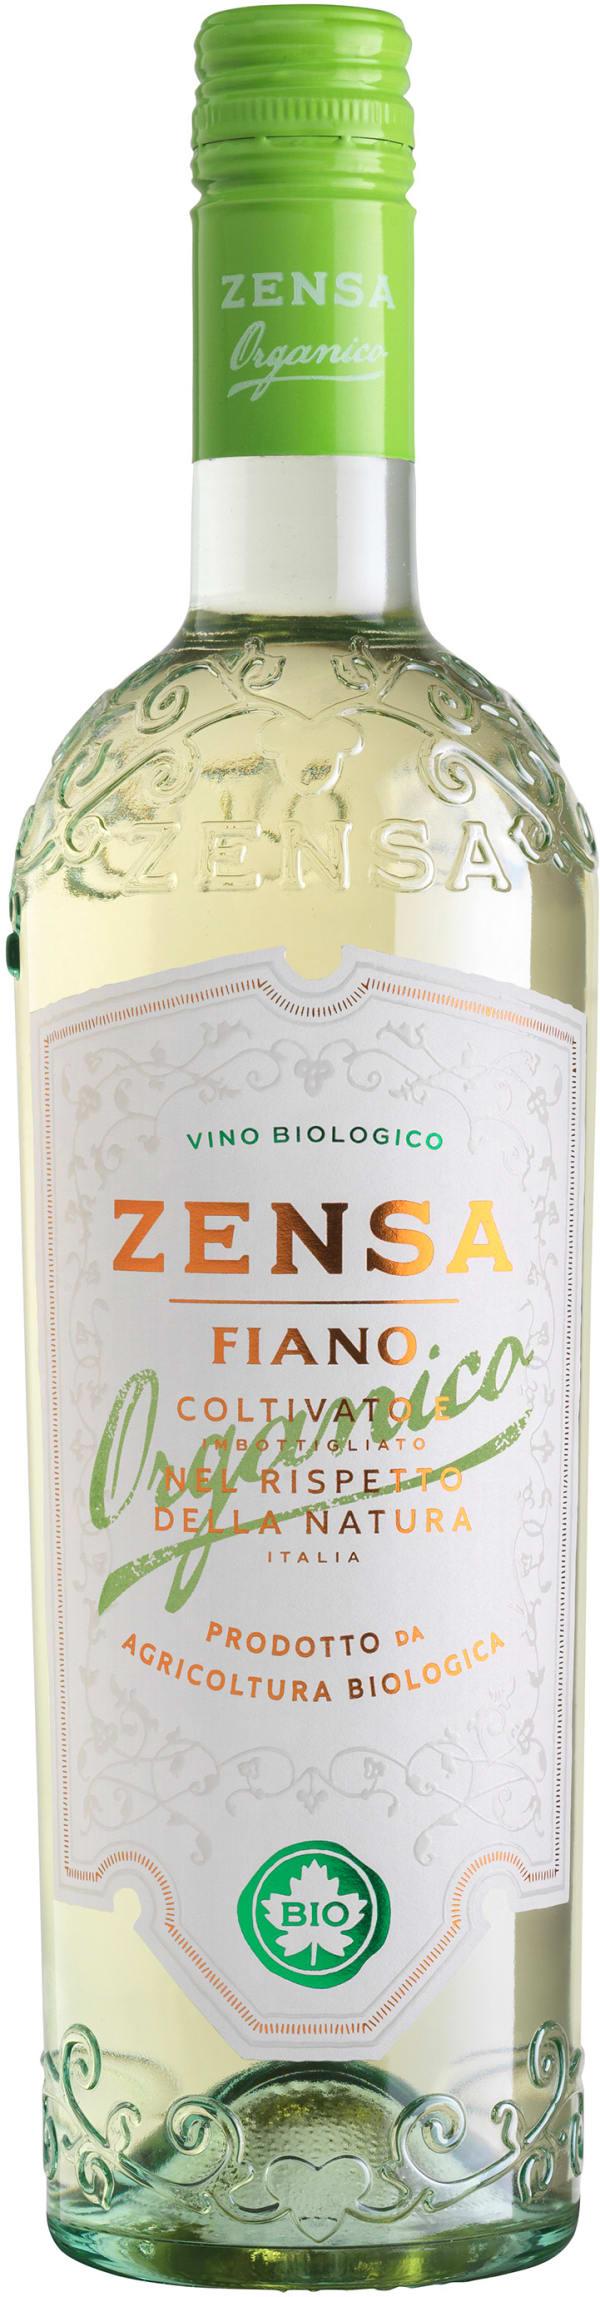 Zensa Fiano Organico 2019